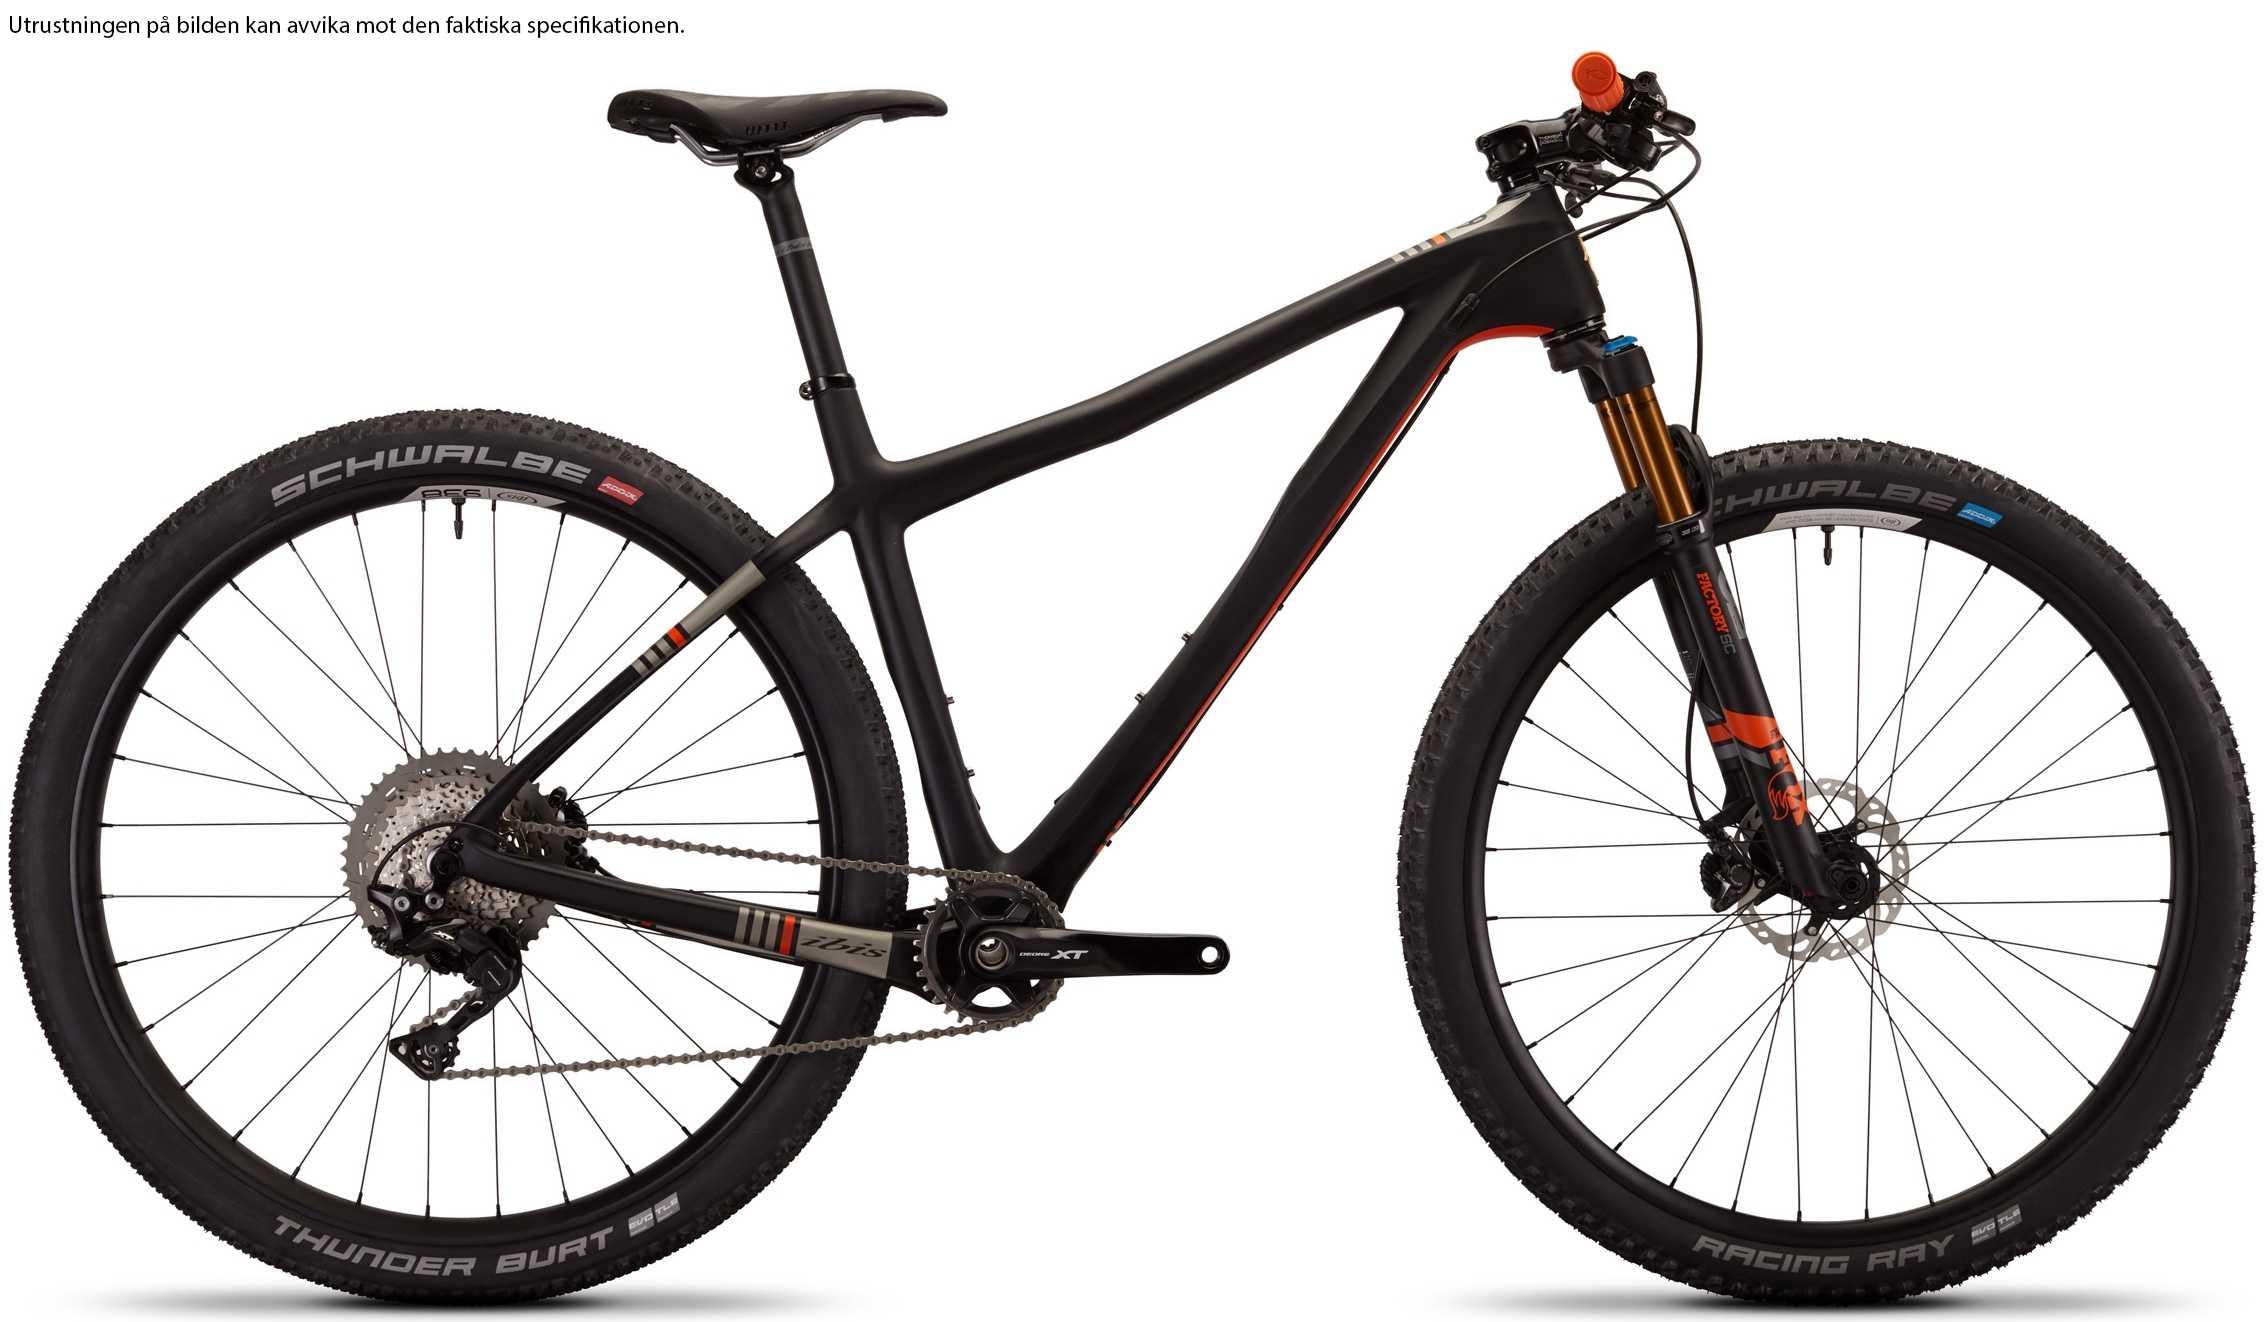 Ibis DV9 XT i9 Carbon CK Edition black/orange medium